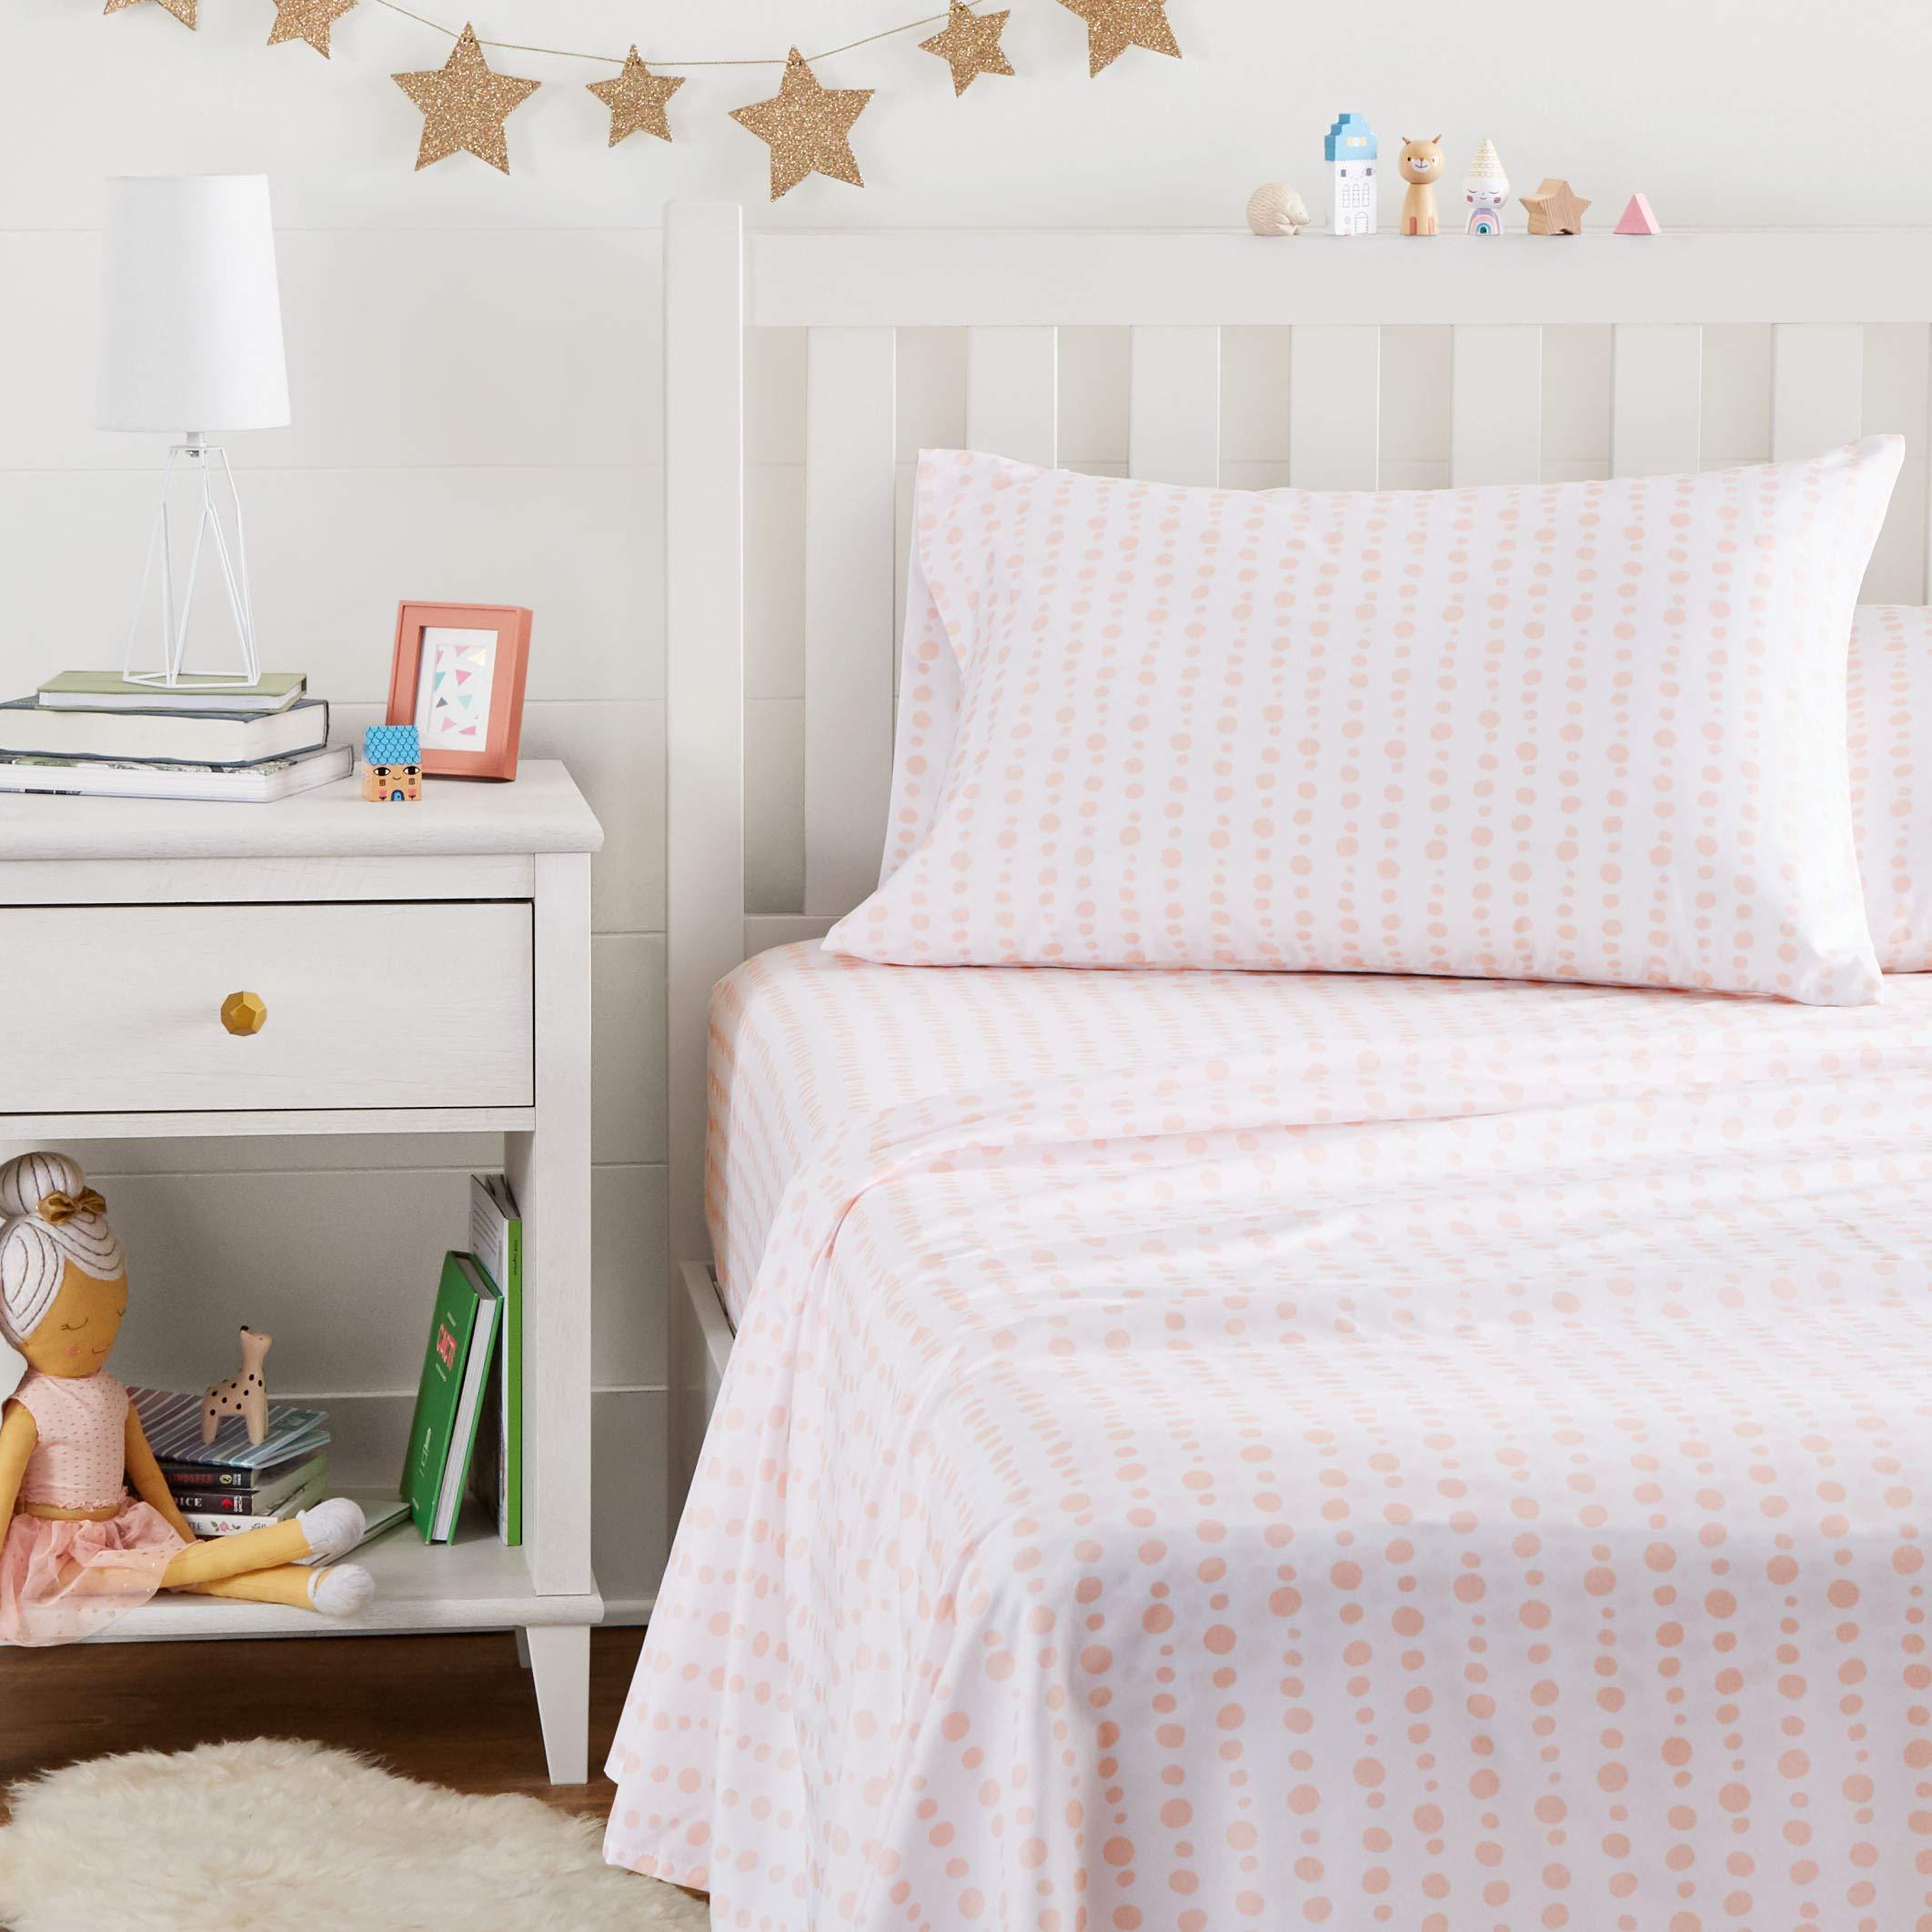 AmazonBasics Kid's Sheet Set - Soft, Easy-Wash Microfiber - Twin, Pink Dotted Stripes by AmazonBasics (Image #3)